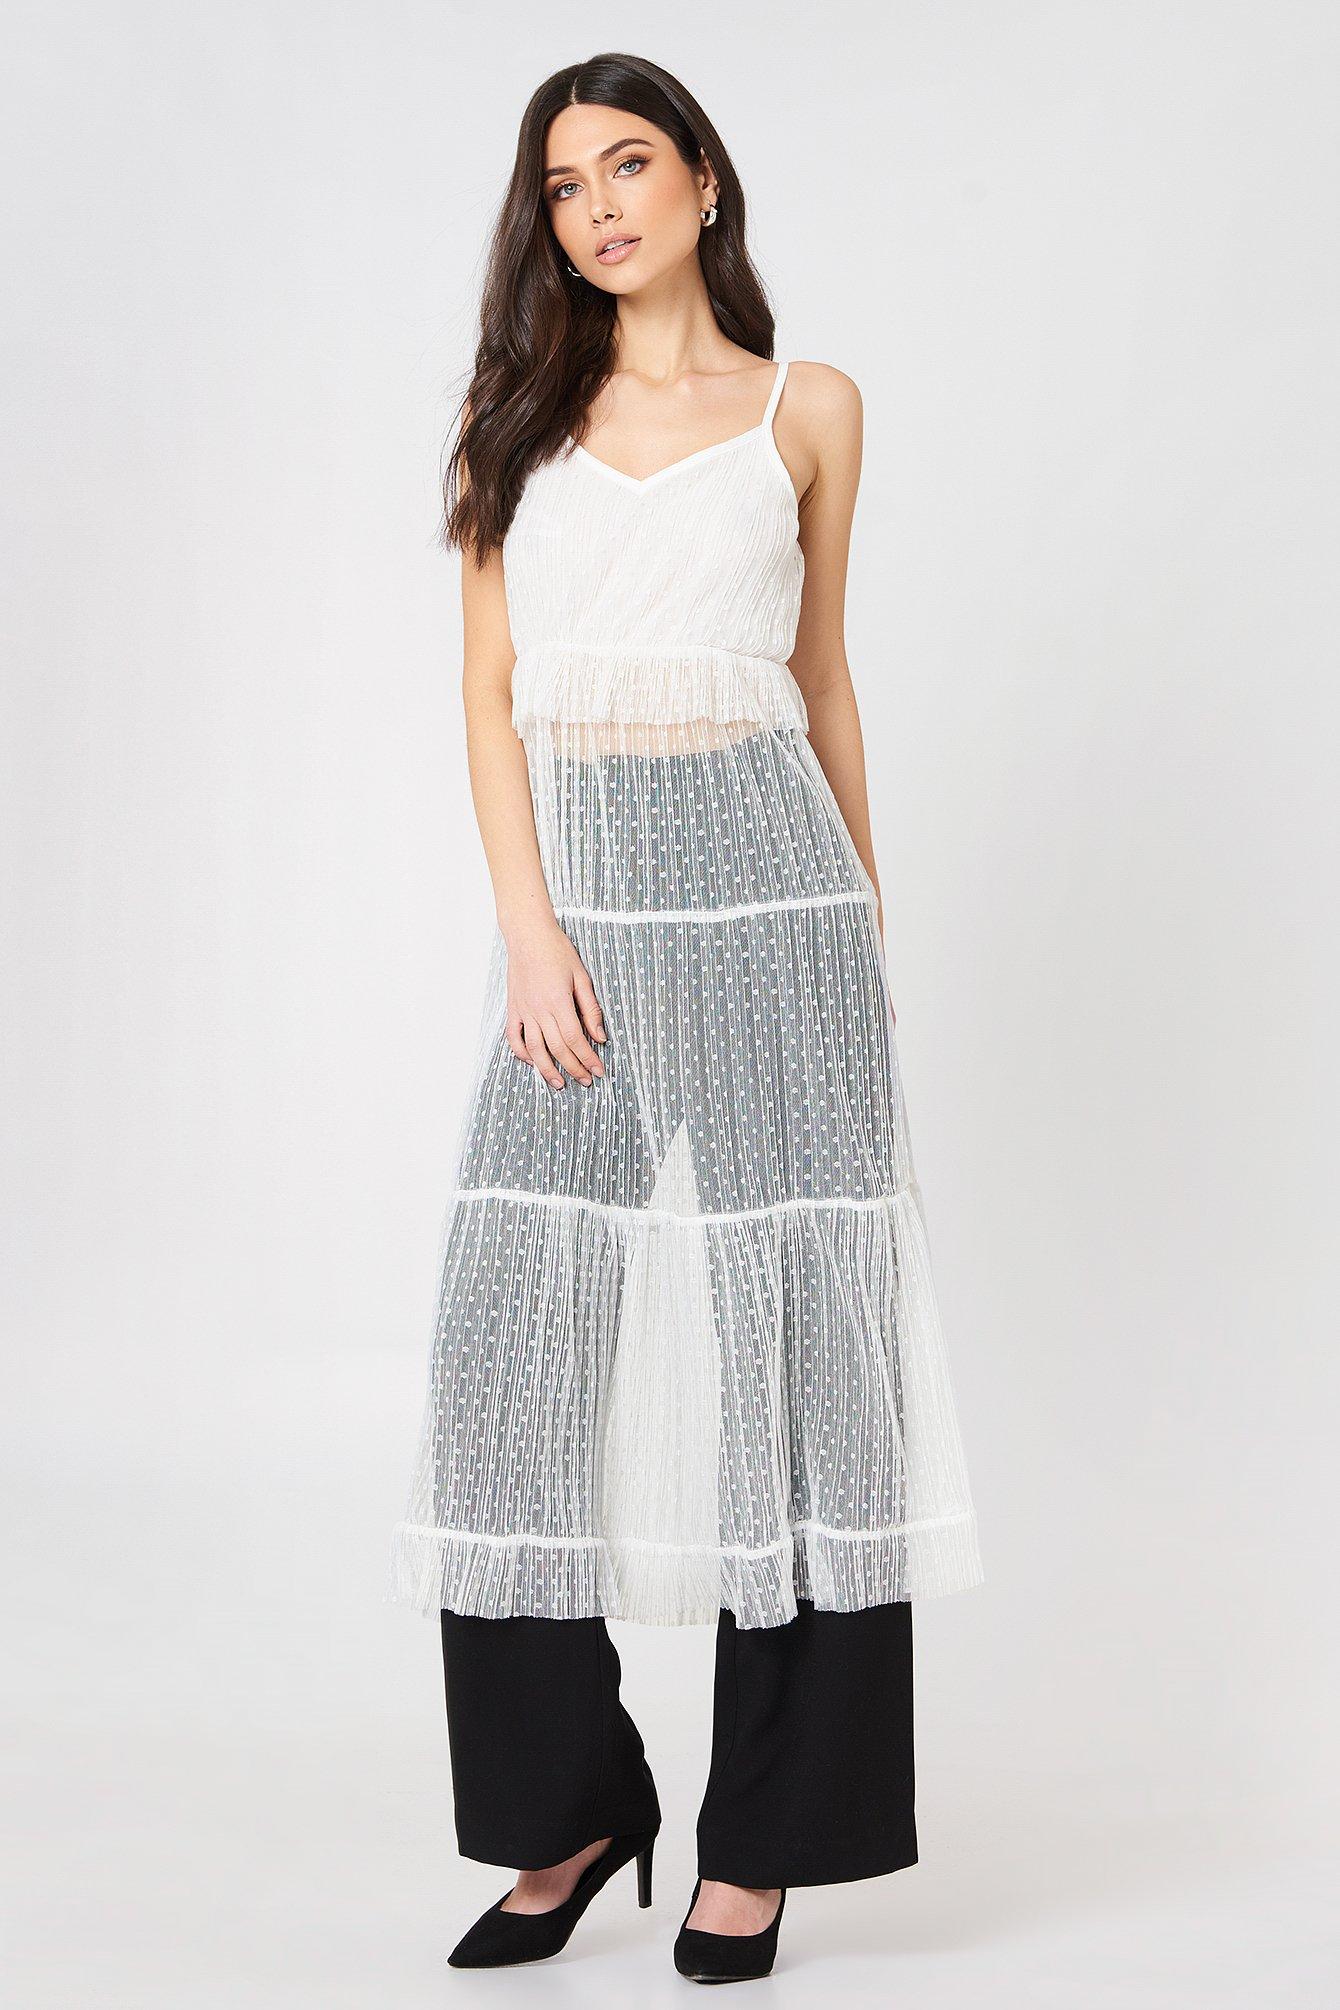 glamorous -  Ruffle Detail Strap Dress - White